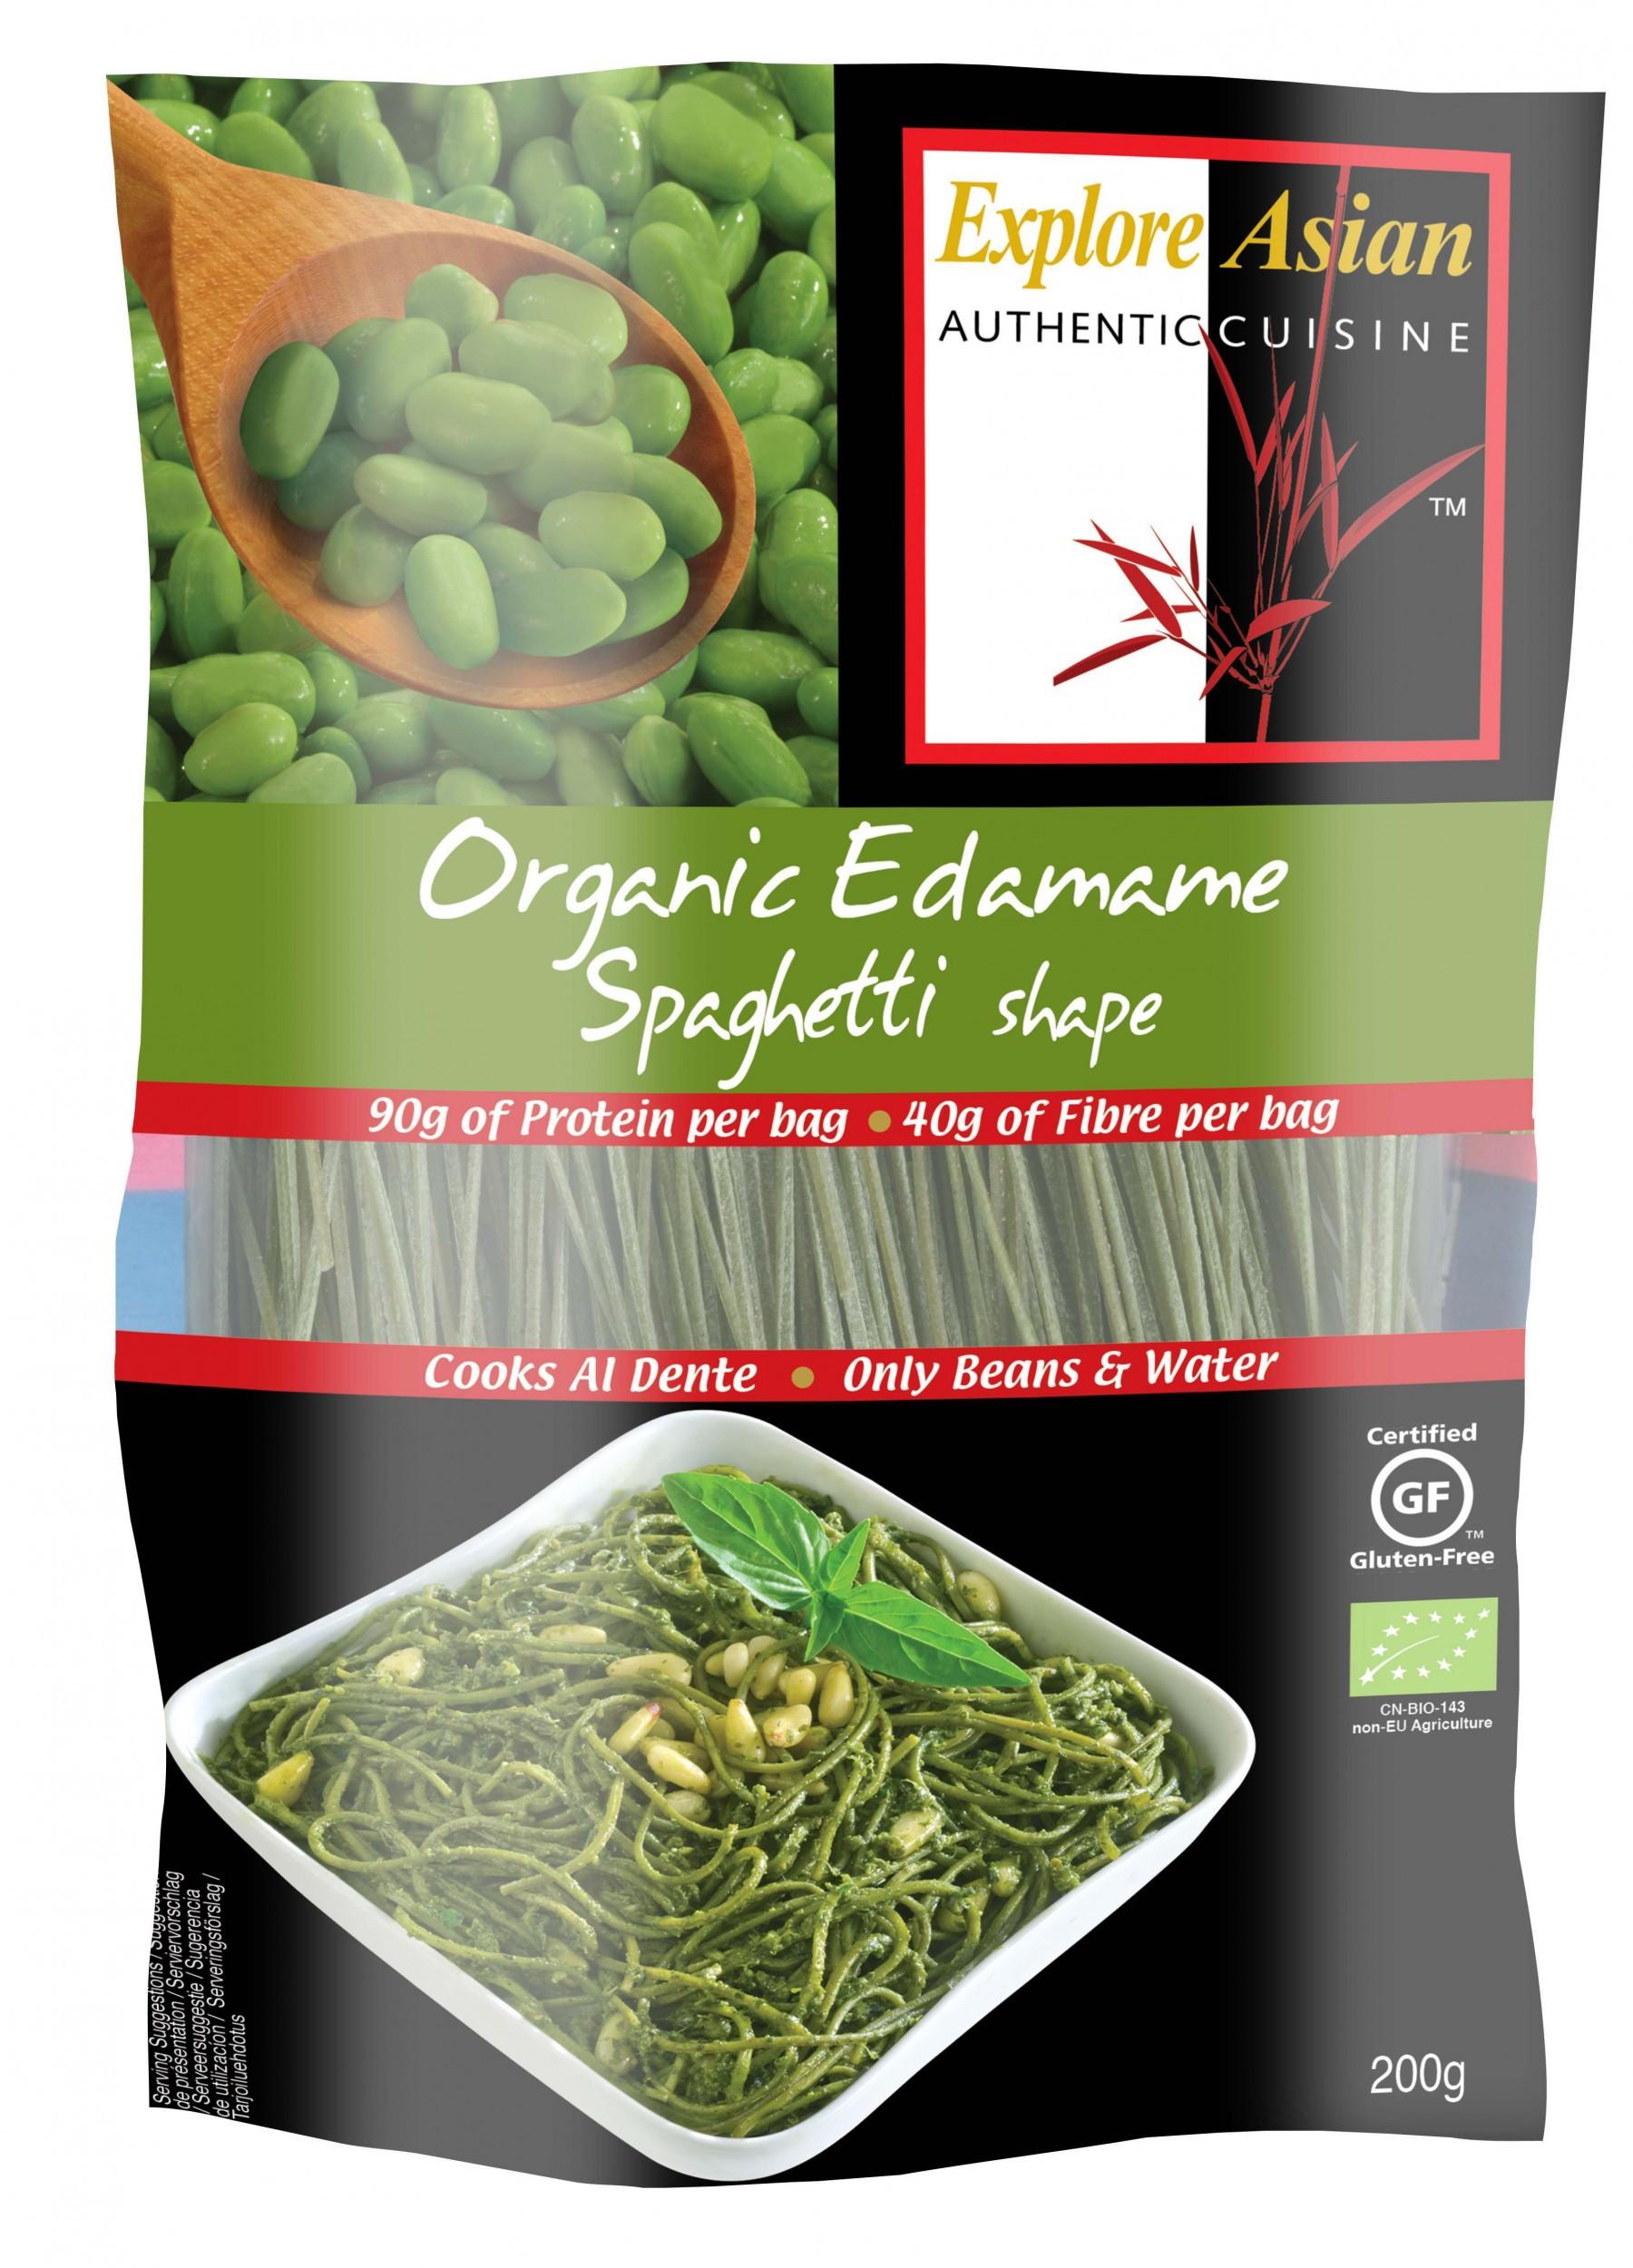 Organic Edamame Spaghetti  Explore Asian Organic Edamame Spaghetti 200g